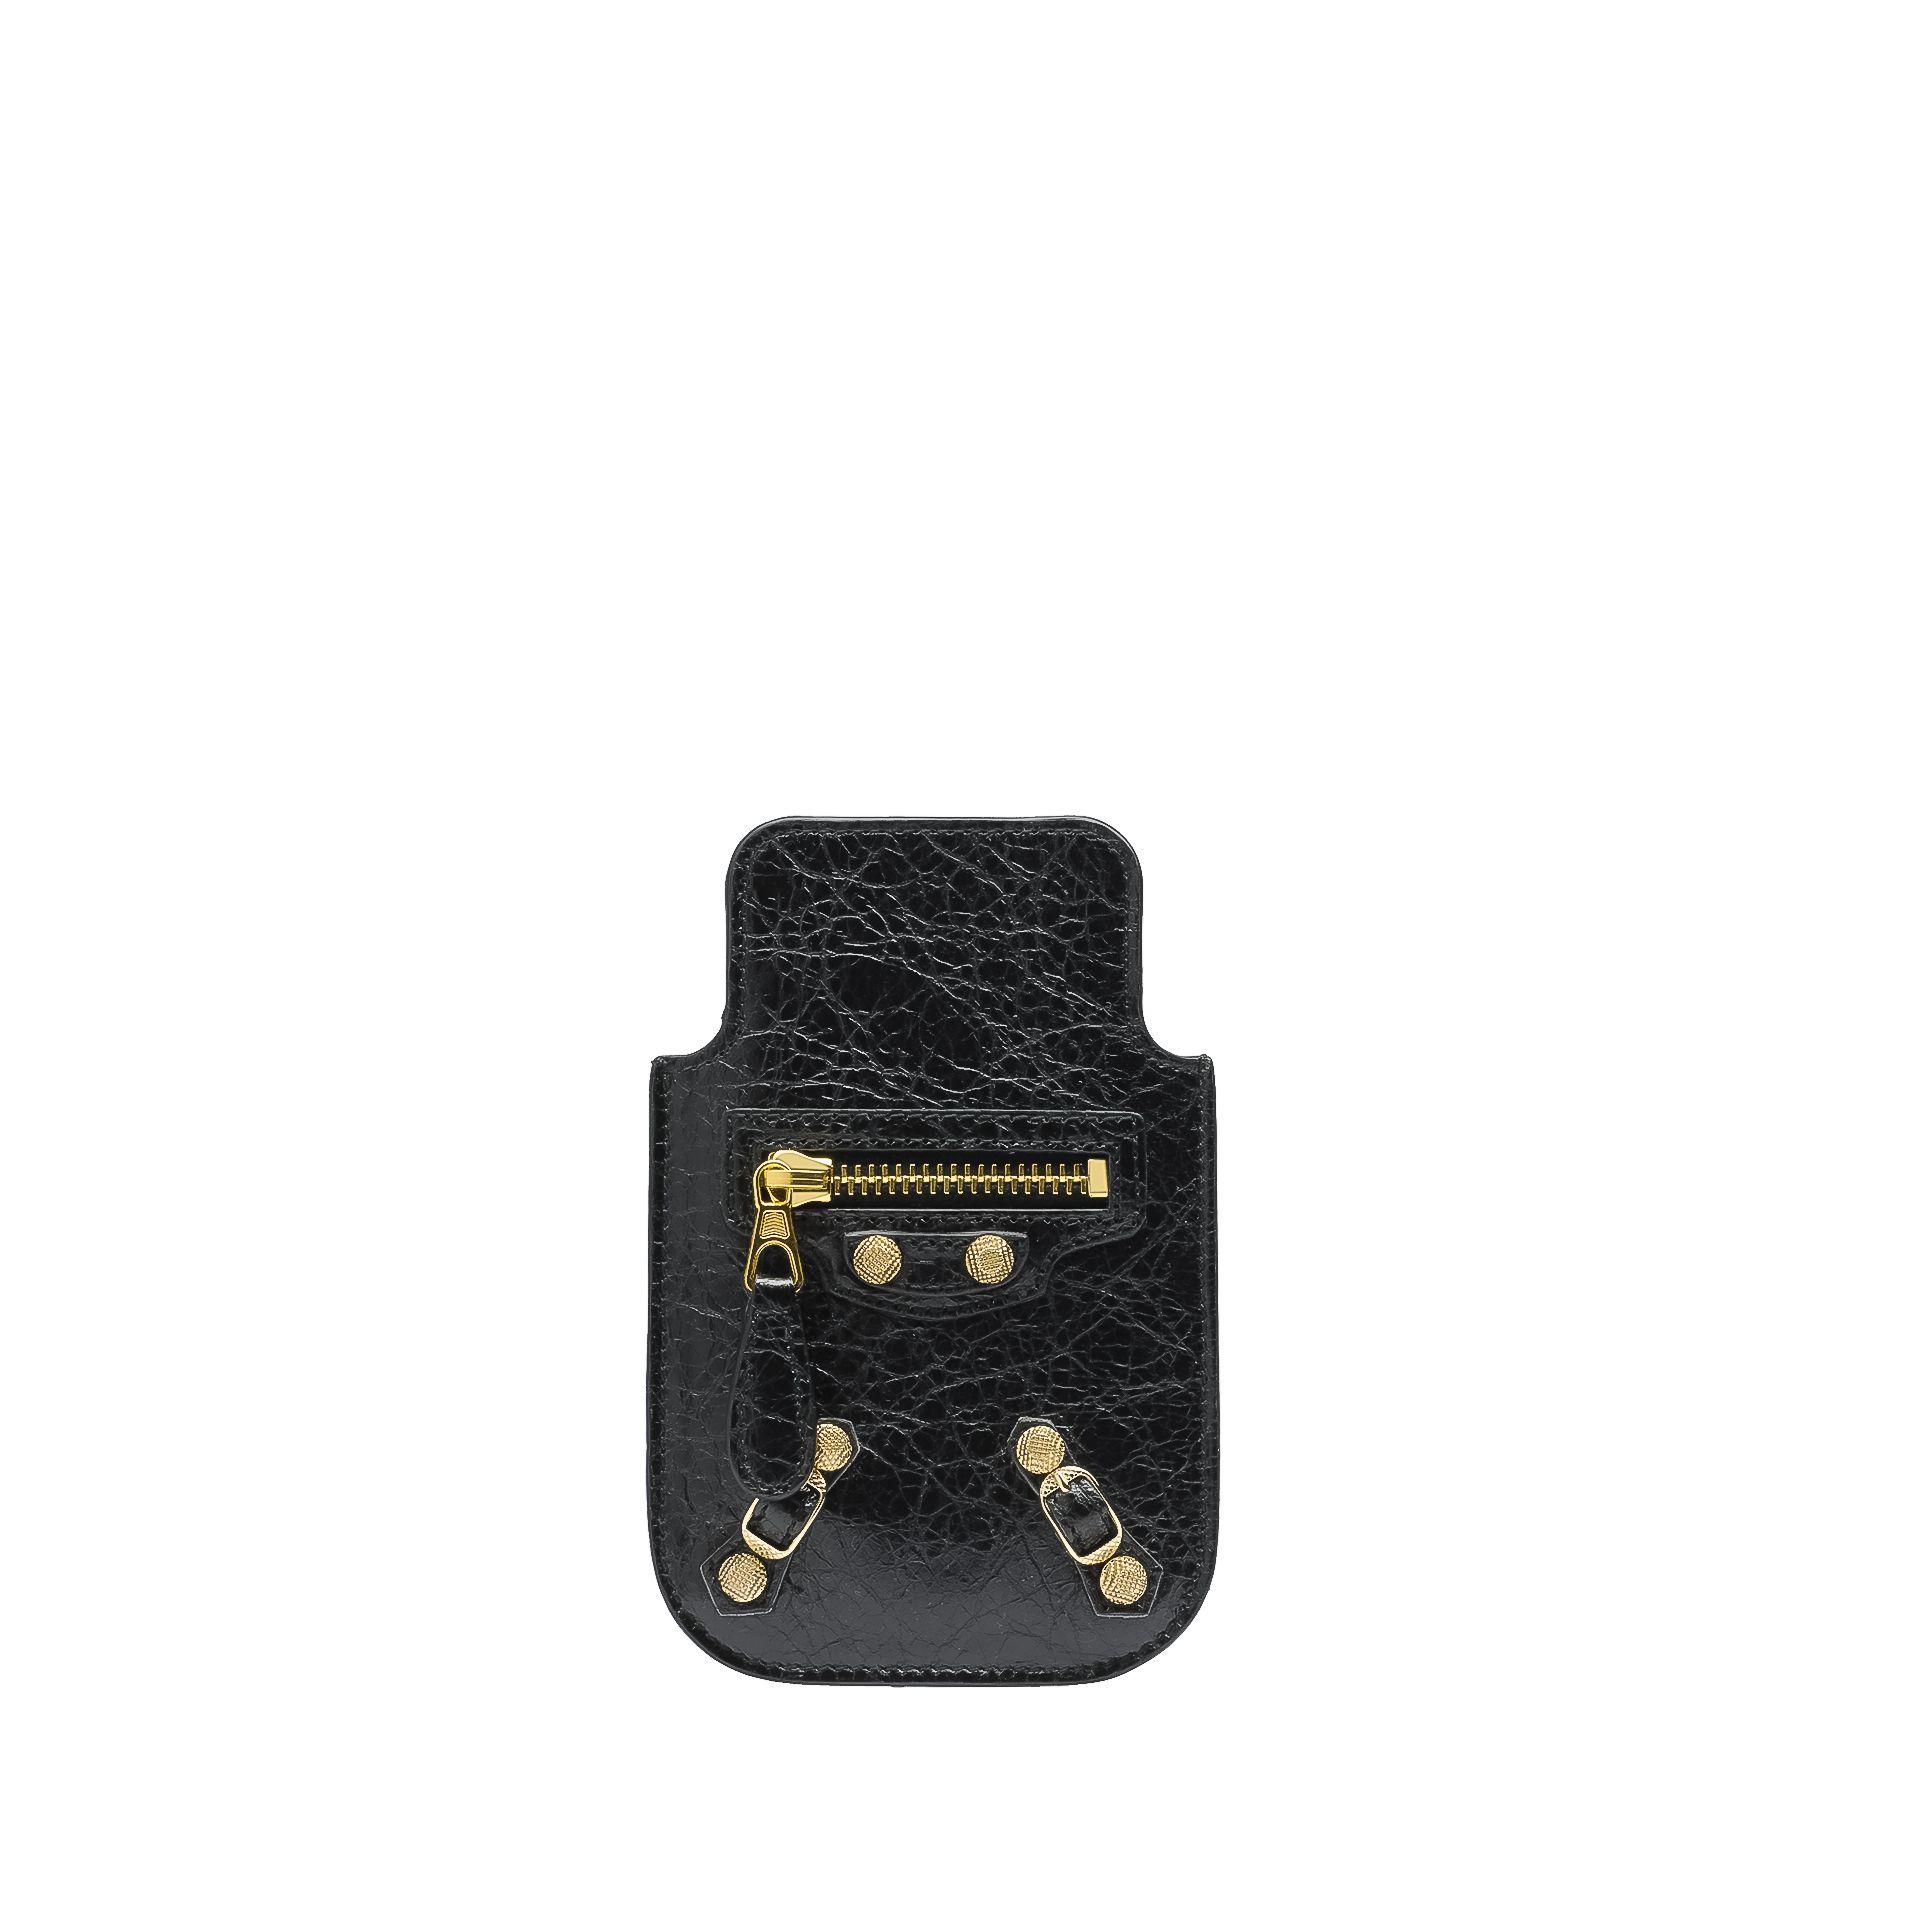 Balenciaga Giant Gold Smart Phone Pouch